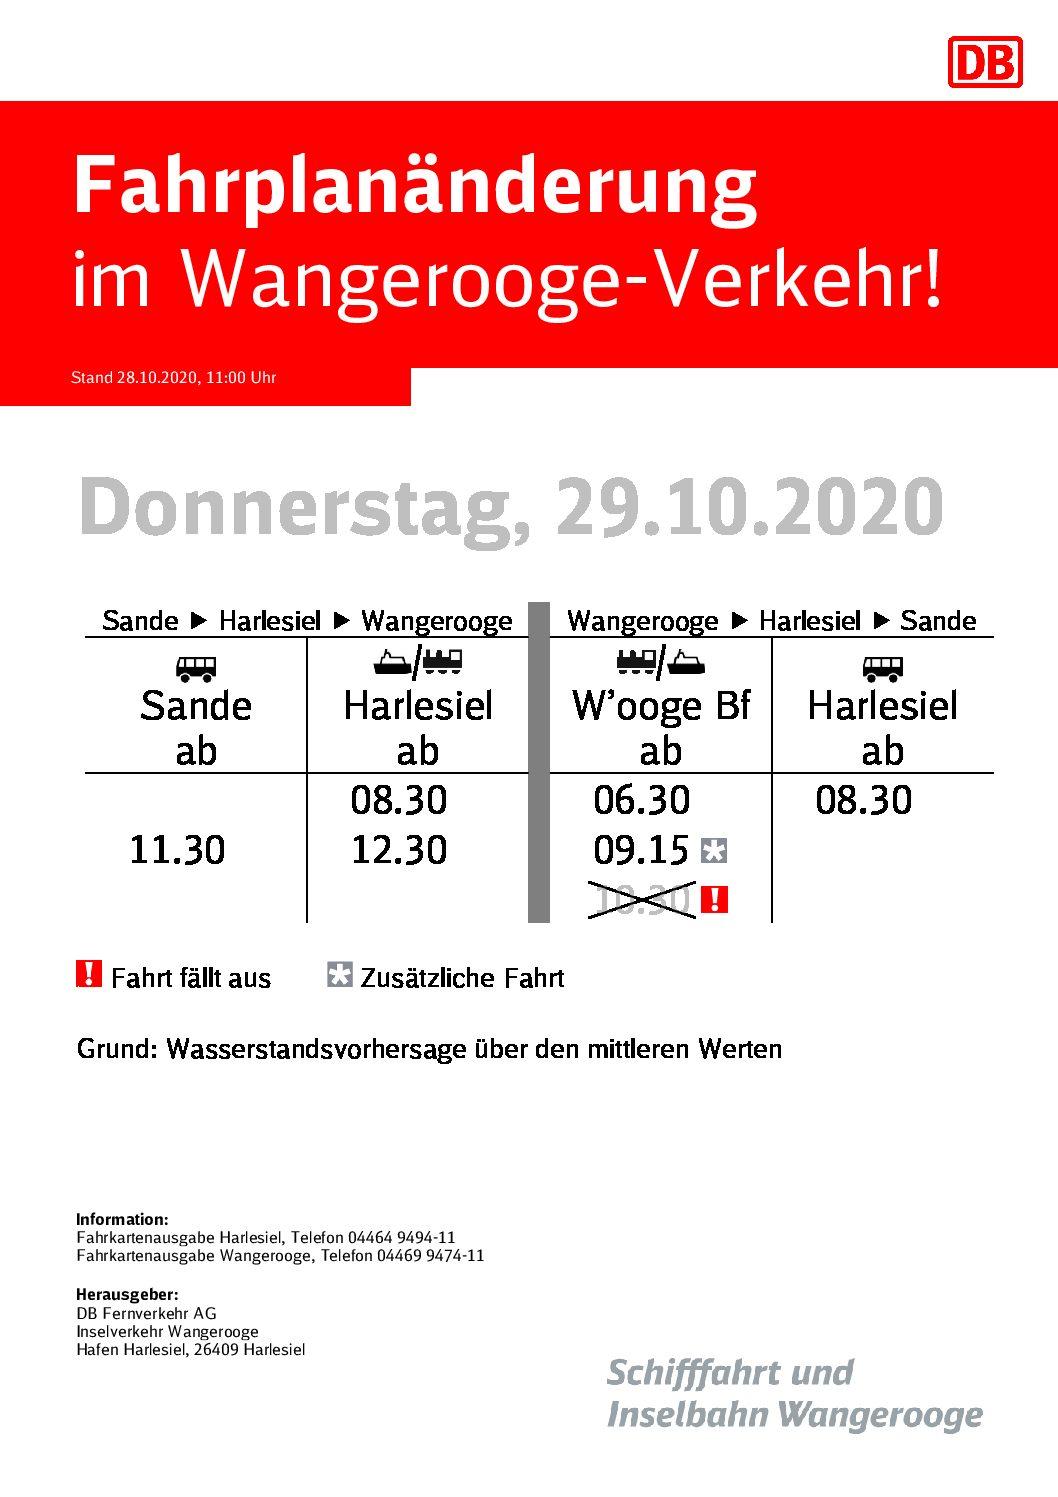 DB/SIW Fahrplanänderung 29.10.2020